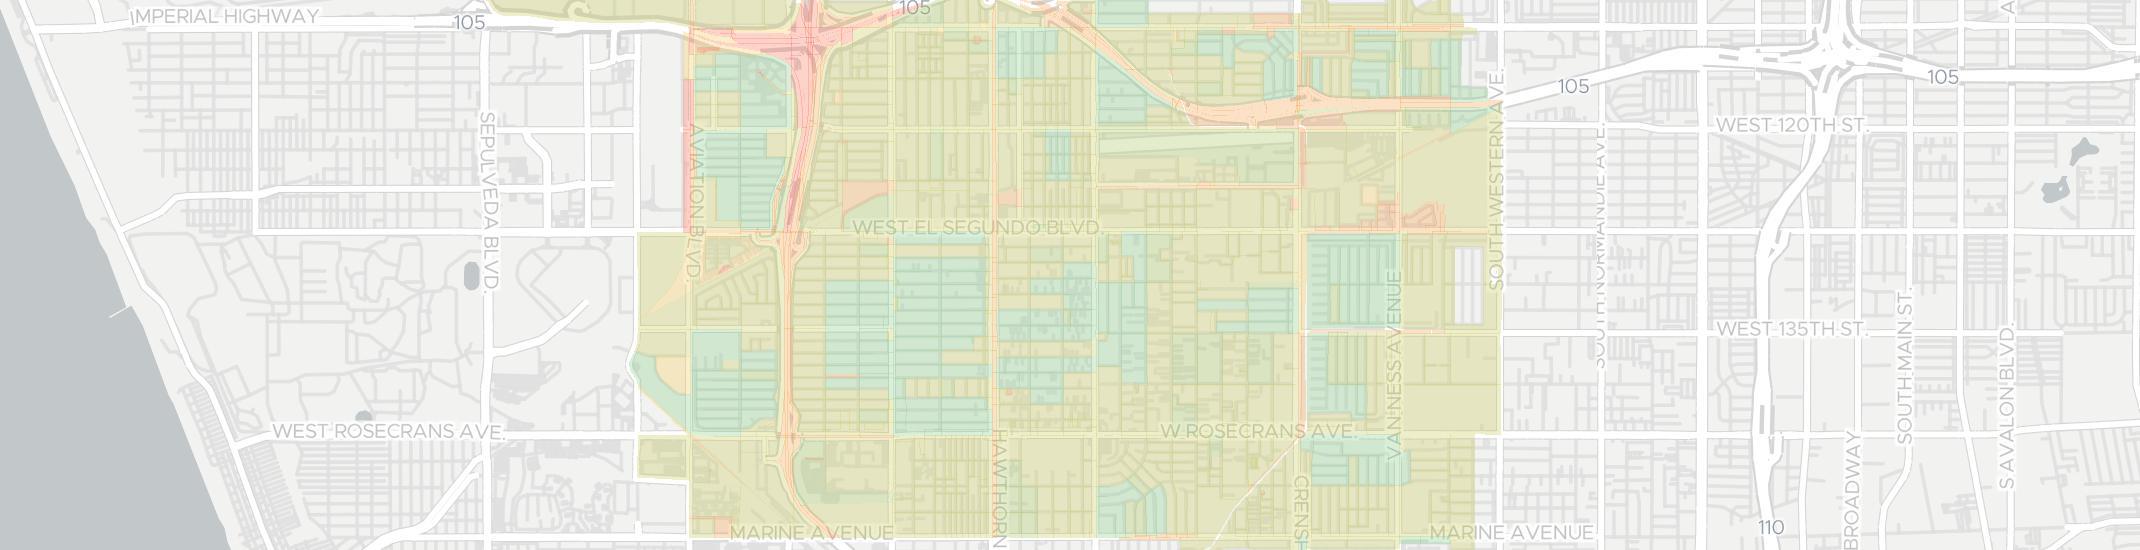 Hawthorne California Map.7 Best Internet Service Providers In Hawthorne Ca Aug 2019